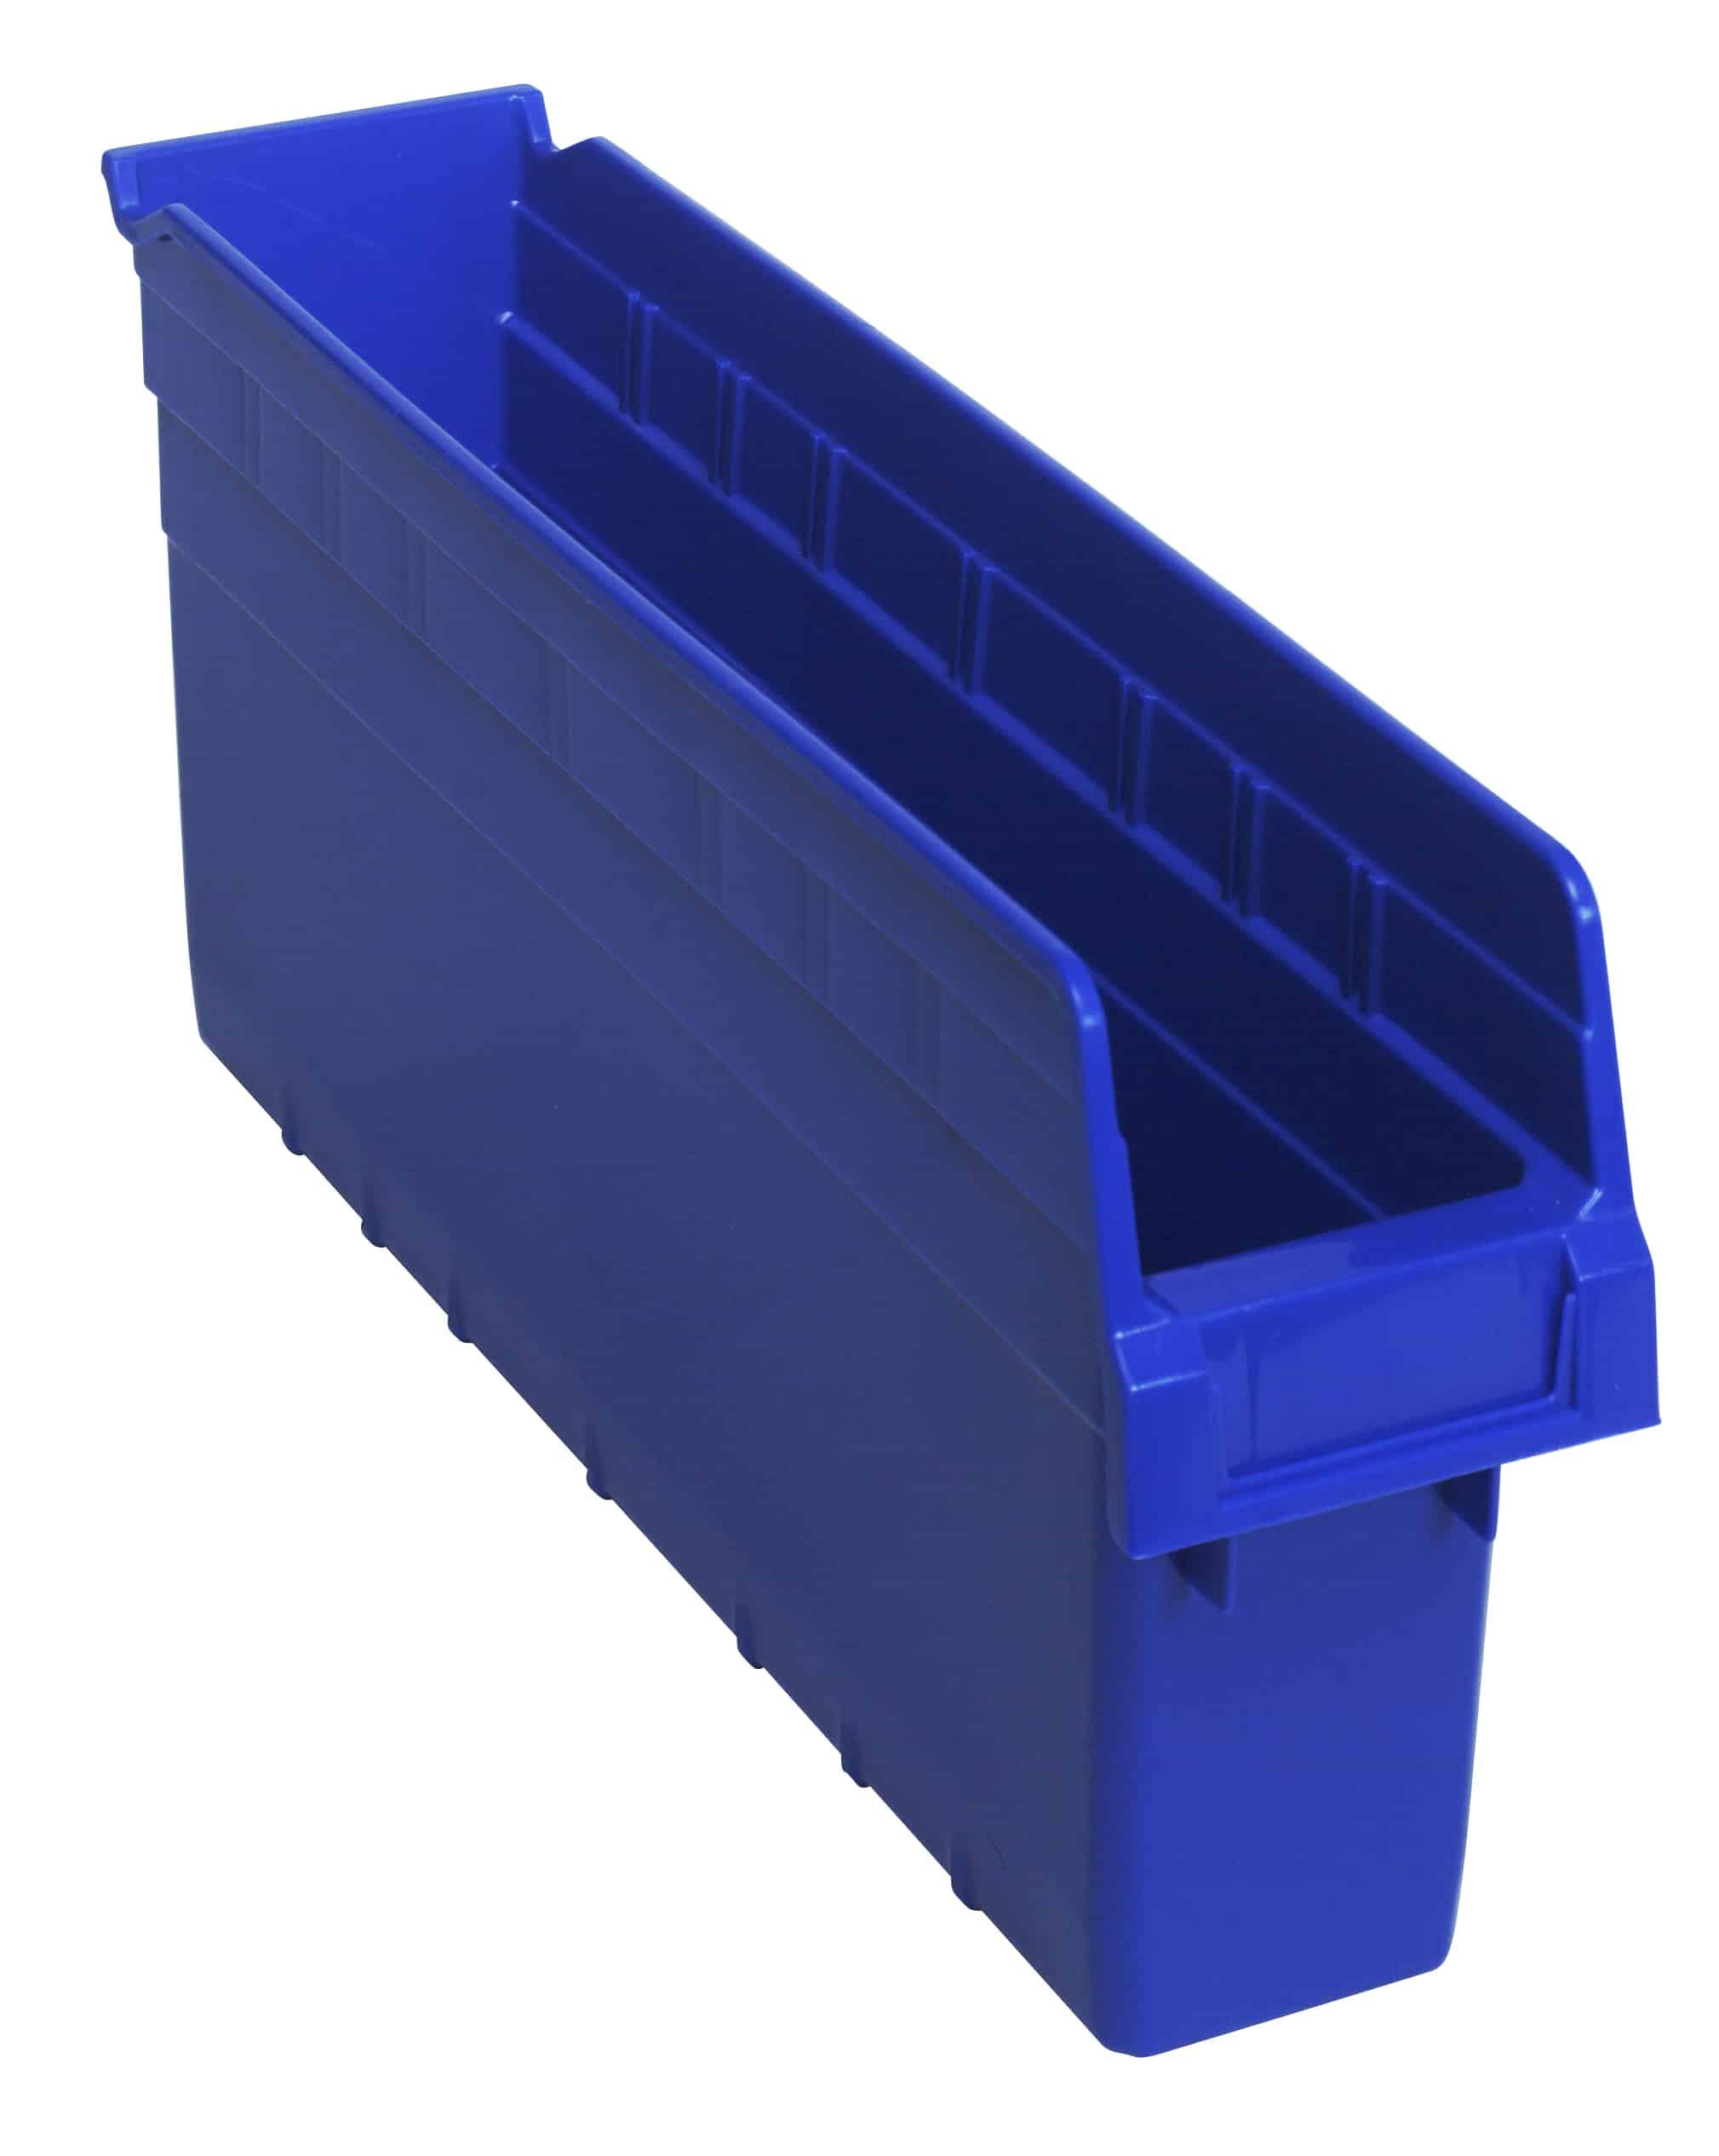 QSB803 blue